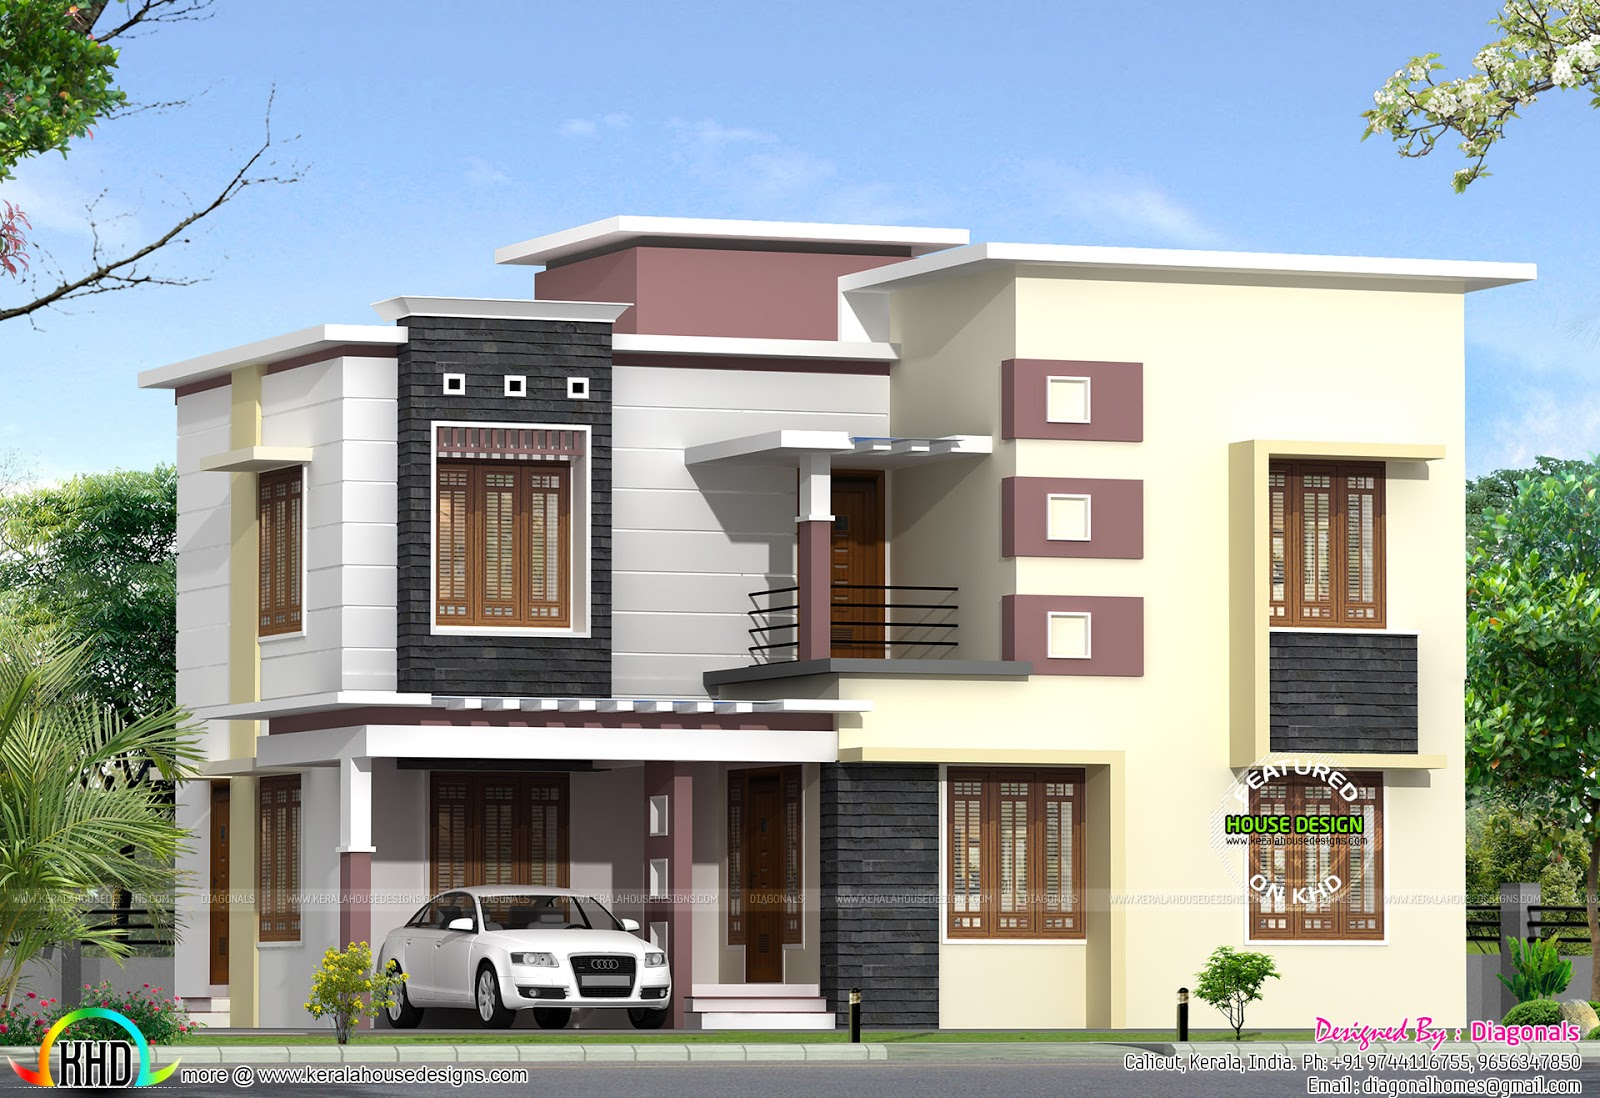 Modern box type 2068 sq-ft home | Kerala home design ...